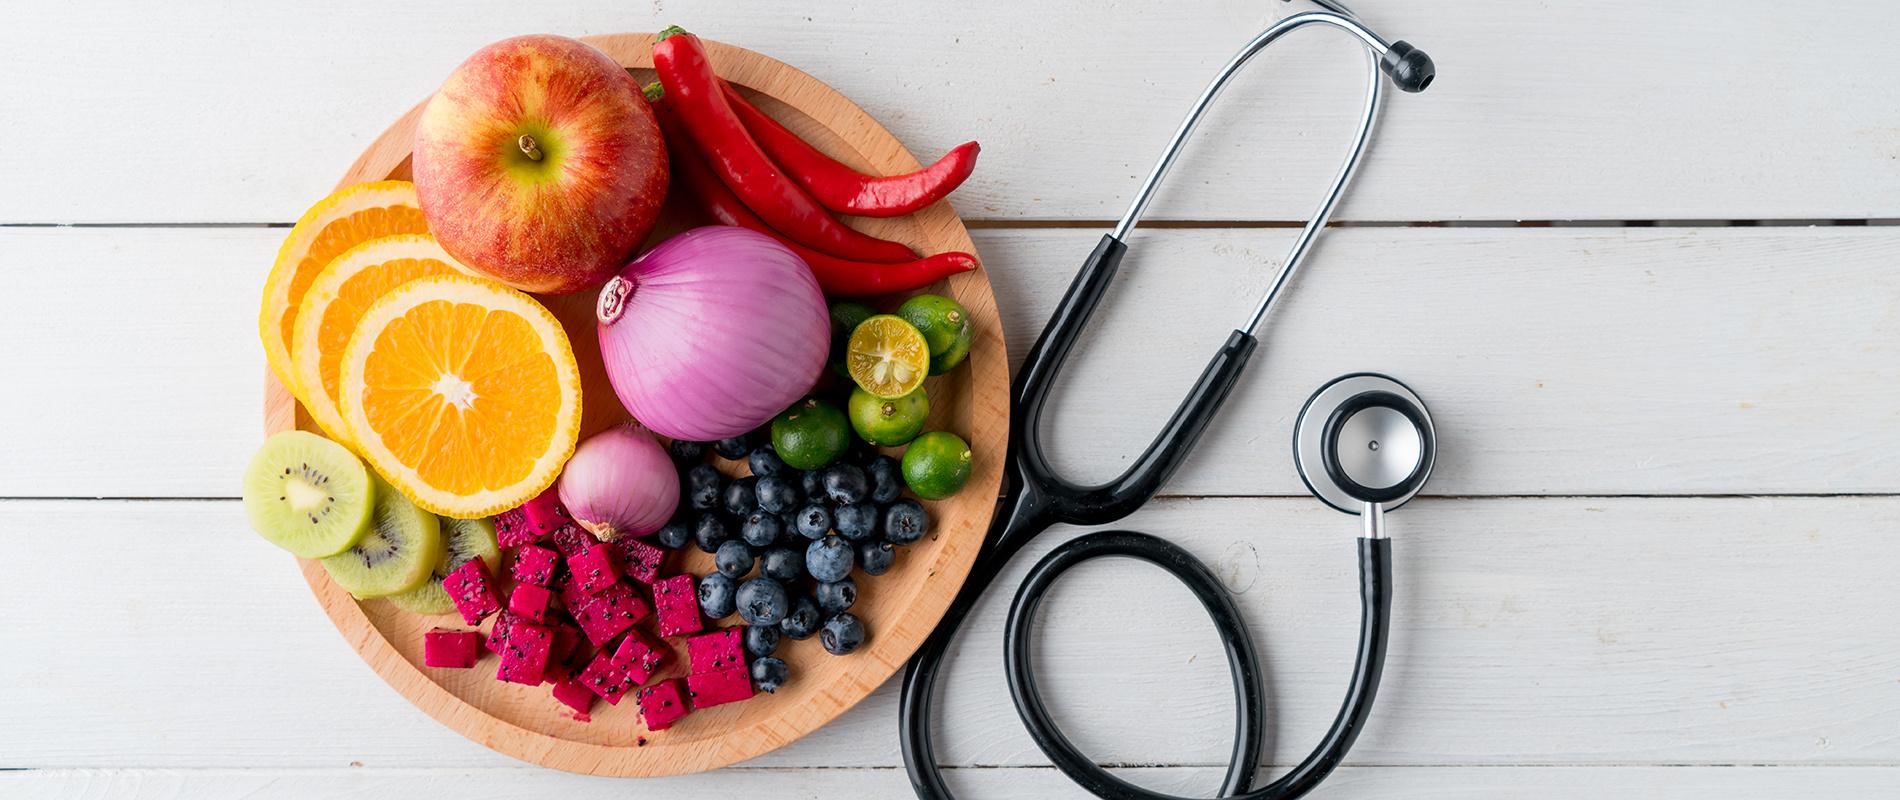 mit kell enni magas vérnyomás miatt magas vérnyomásból